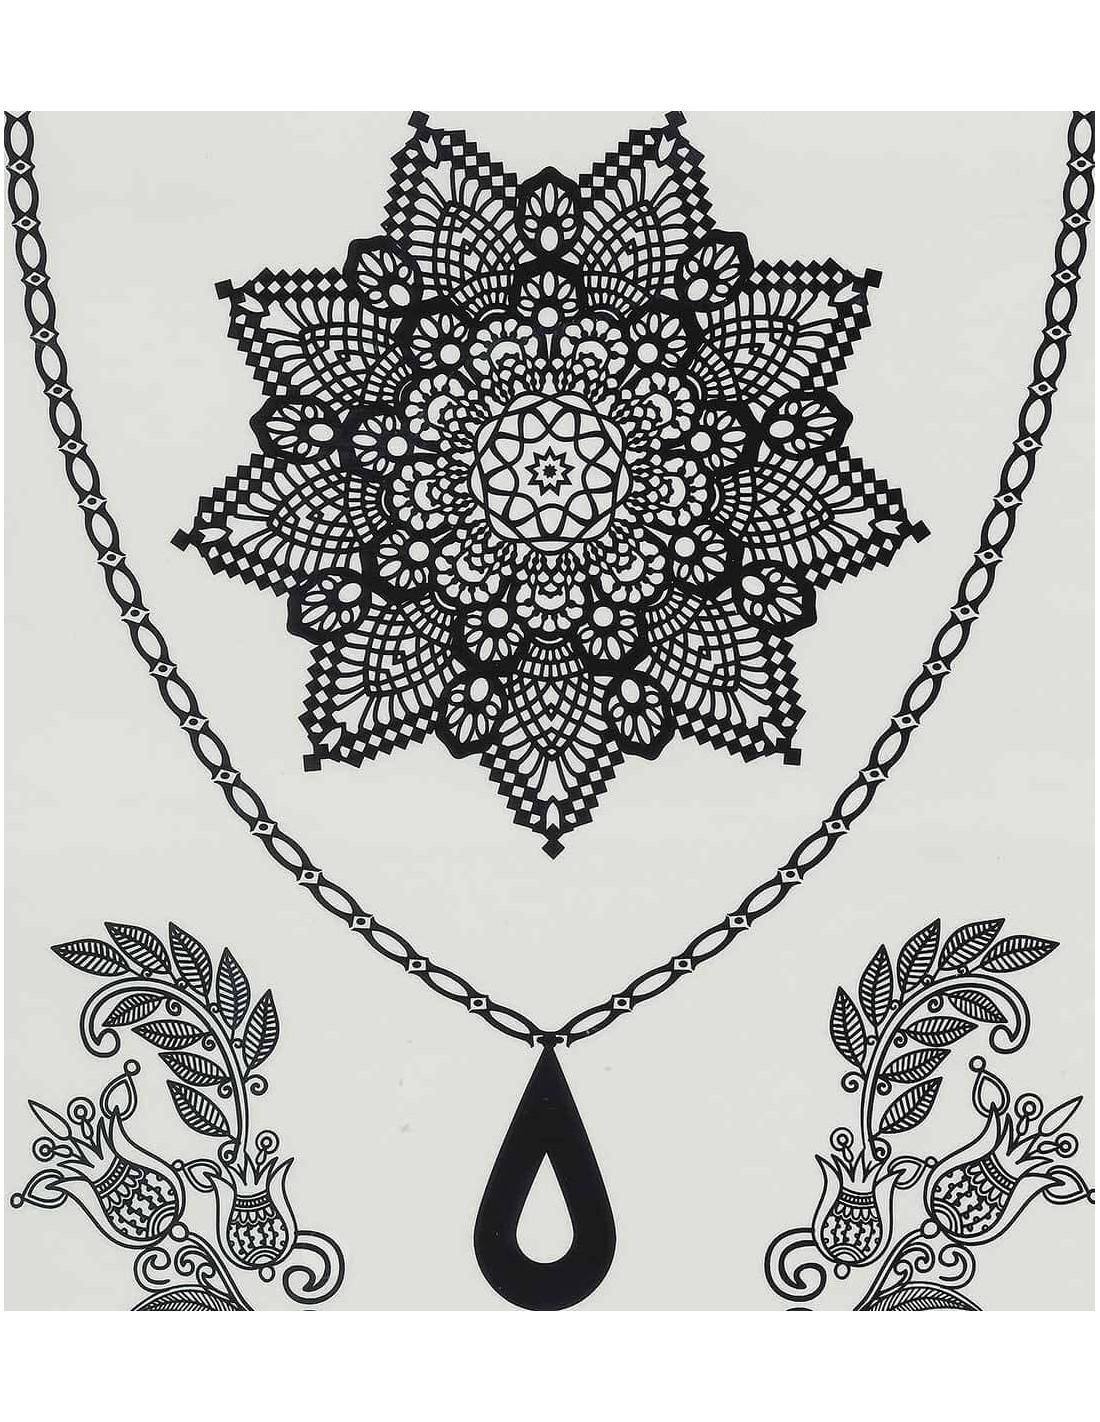 tatouage ph m re mandala dentelles noir axstore market. Black Bedroom Furniture Sets. Home Design Ideas